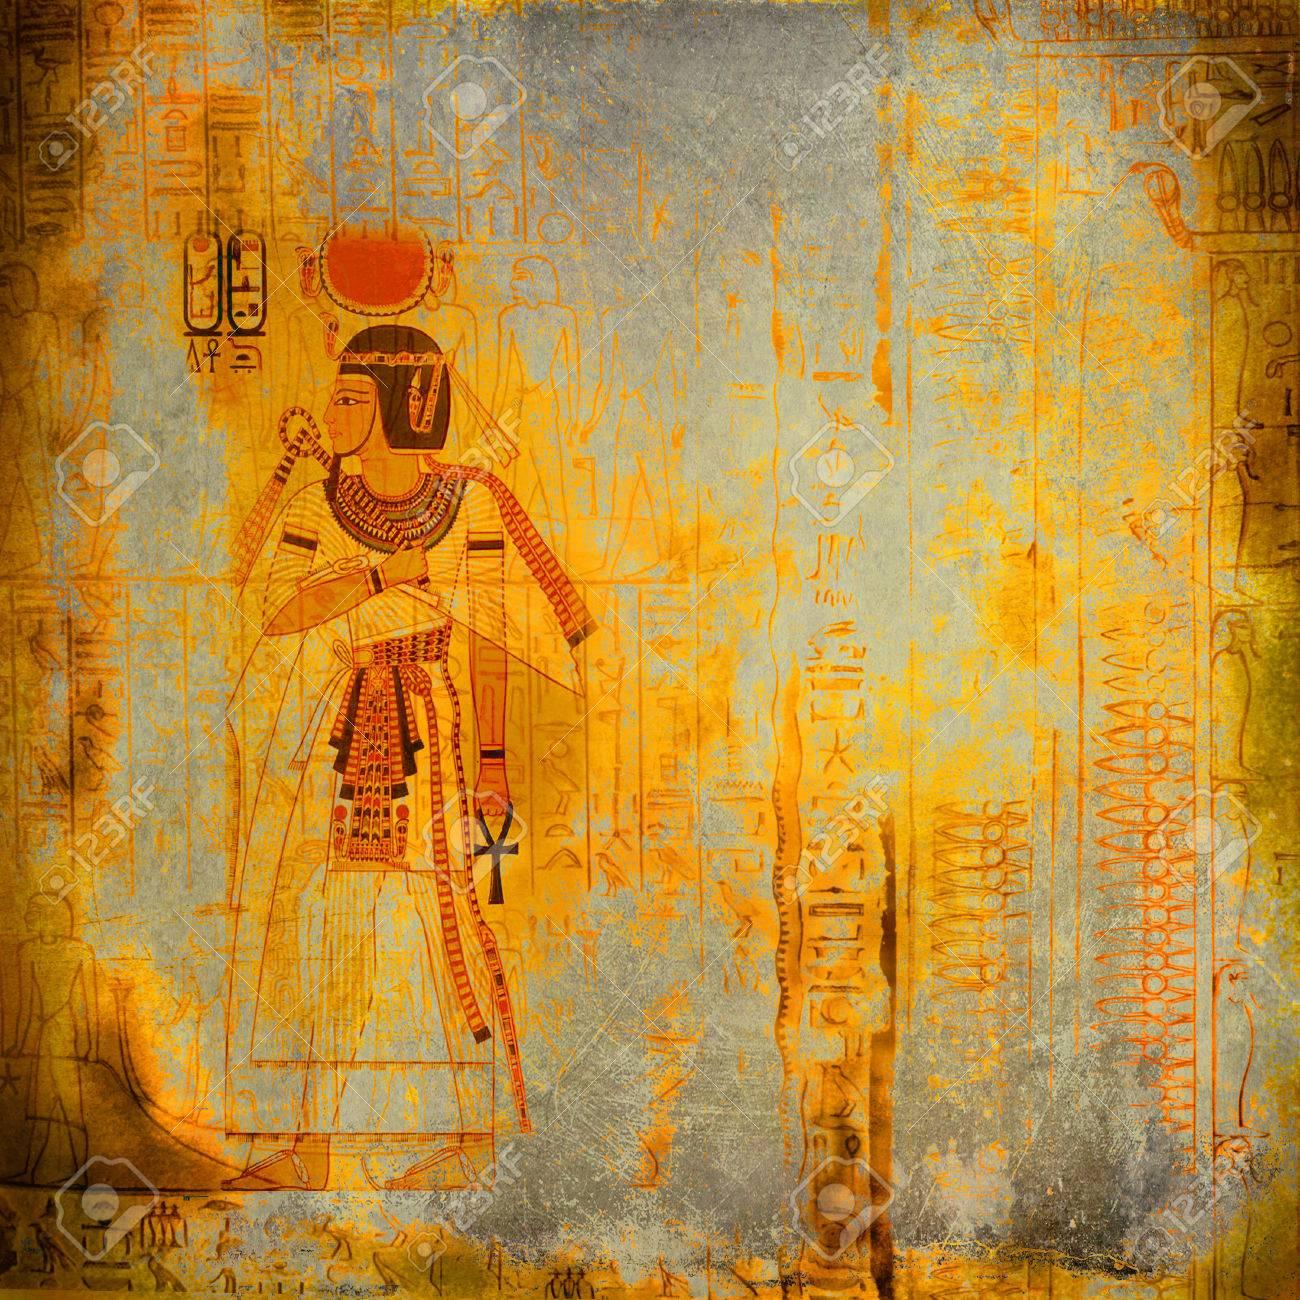 Antique Egytp Wallpaper With Pharaoh And Hieroglyphics Stock Photo